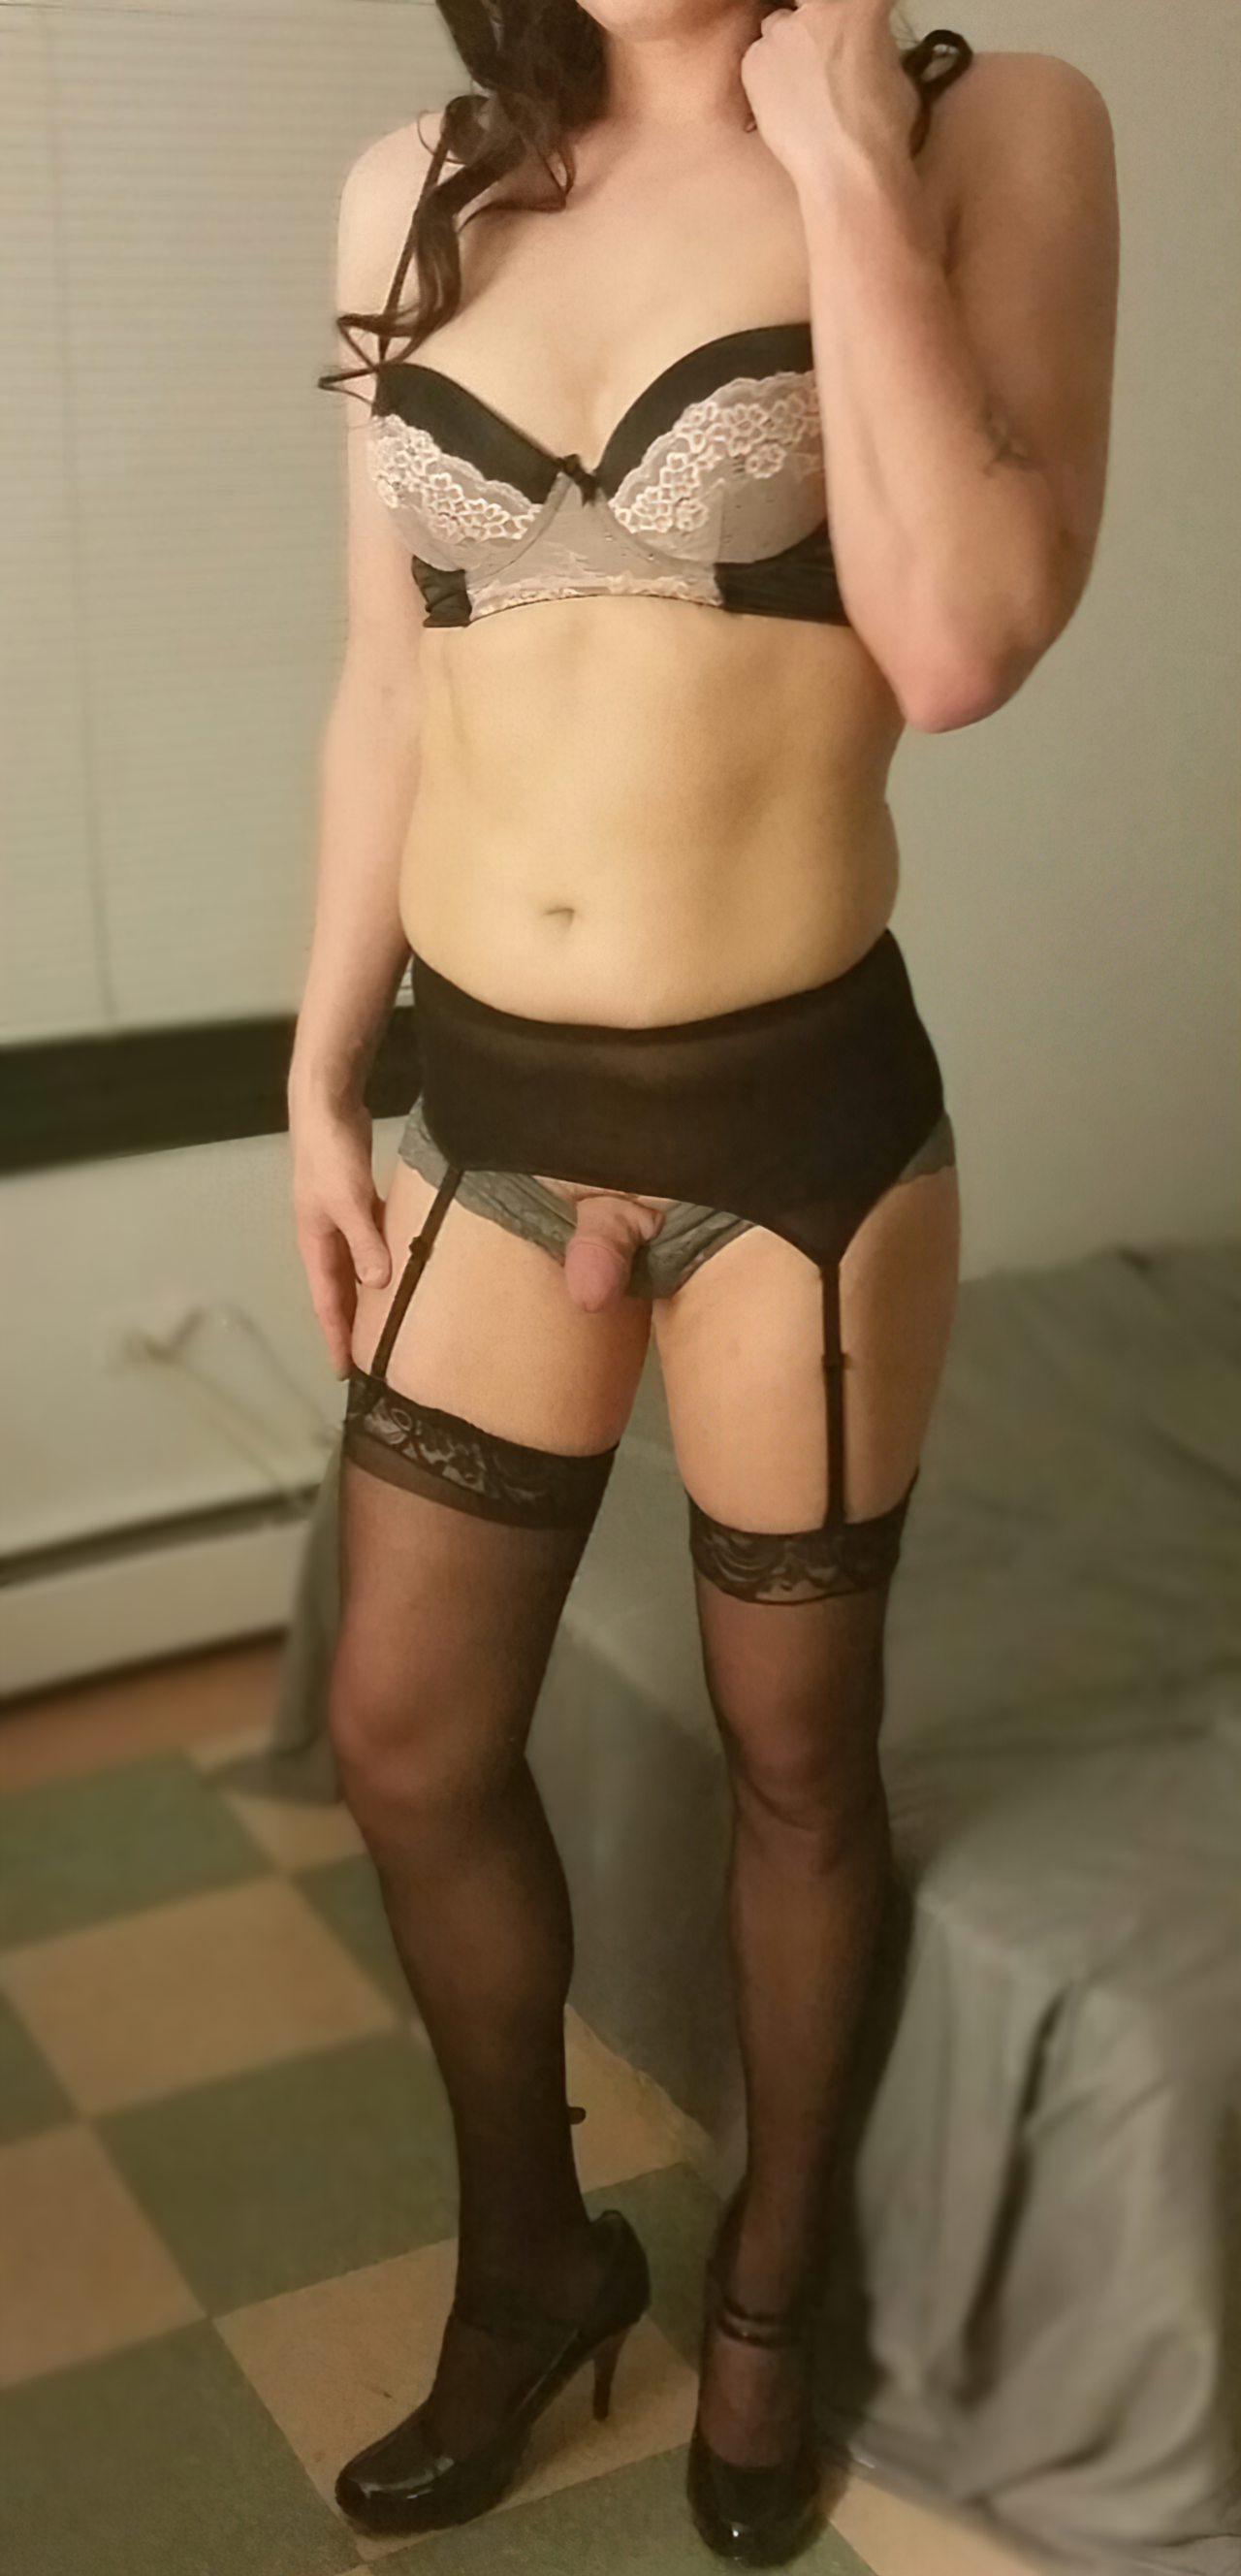 Travestis Pintos Pequenos (24)